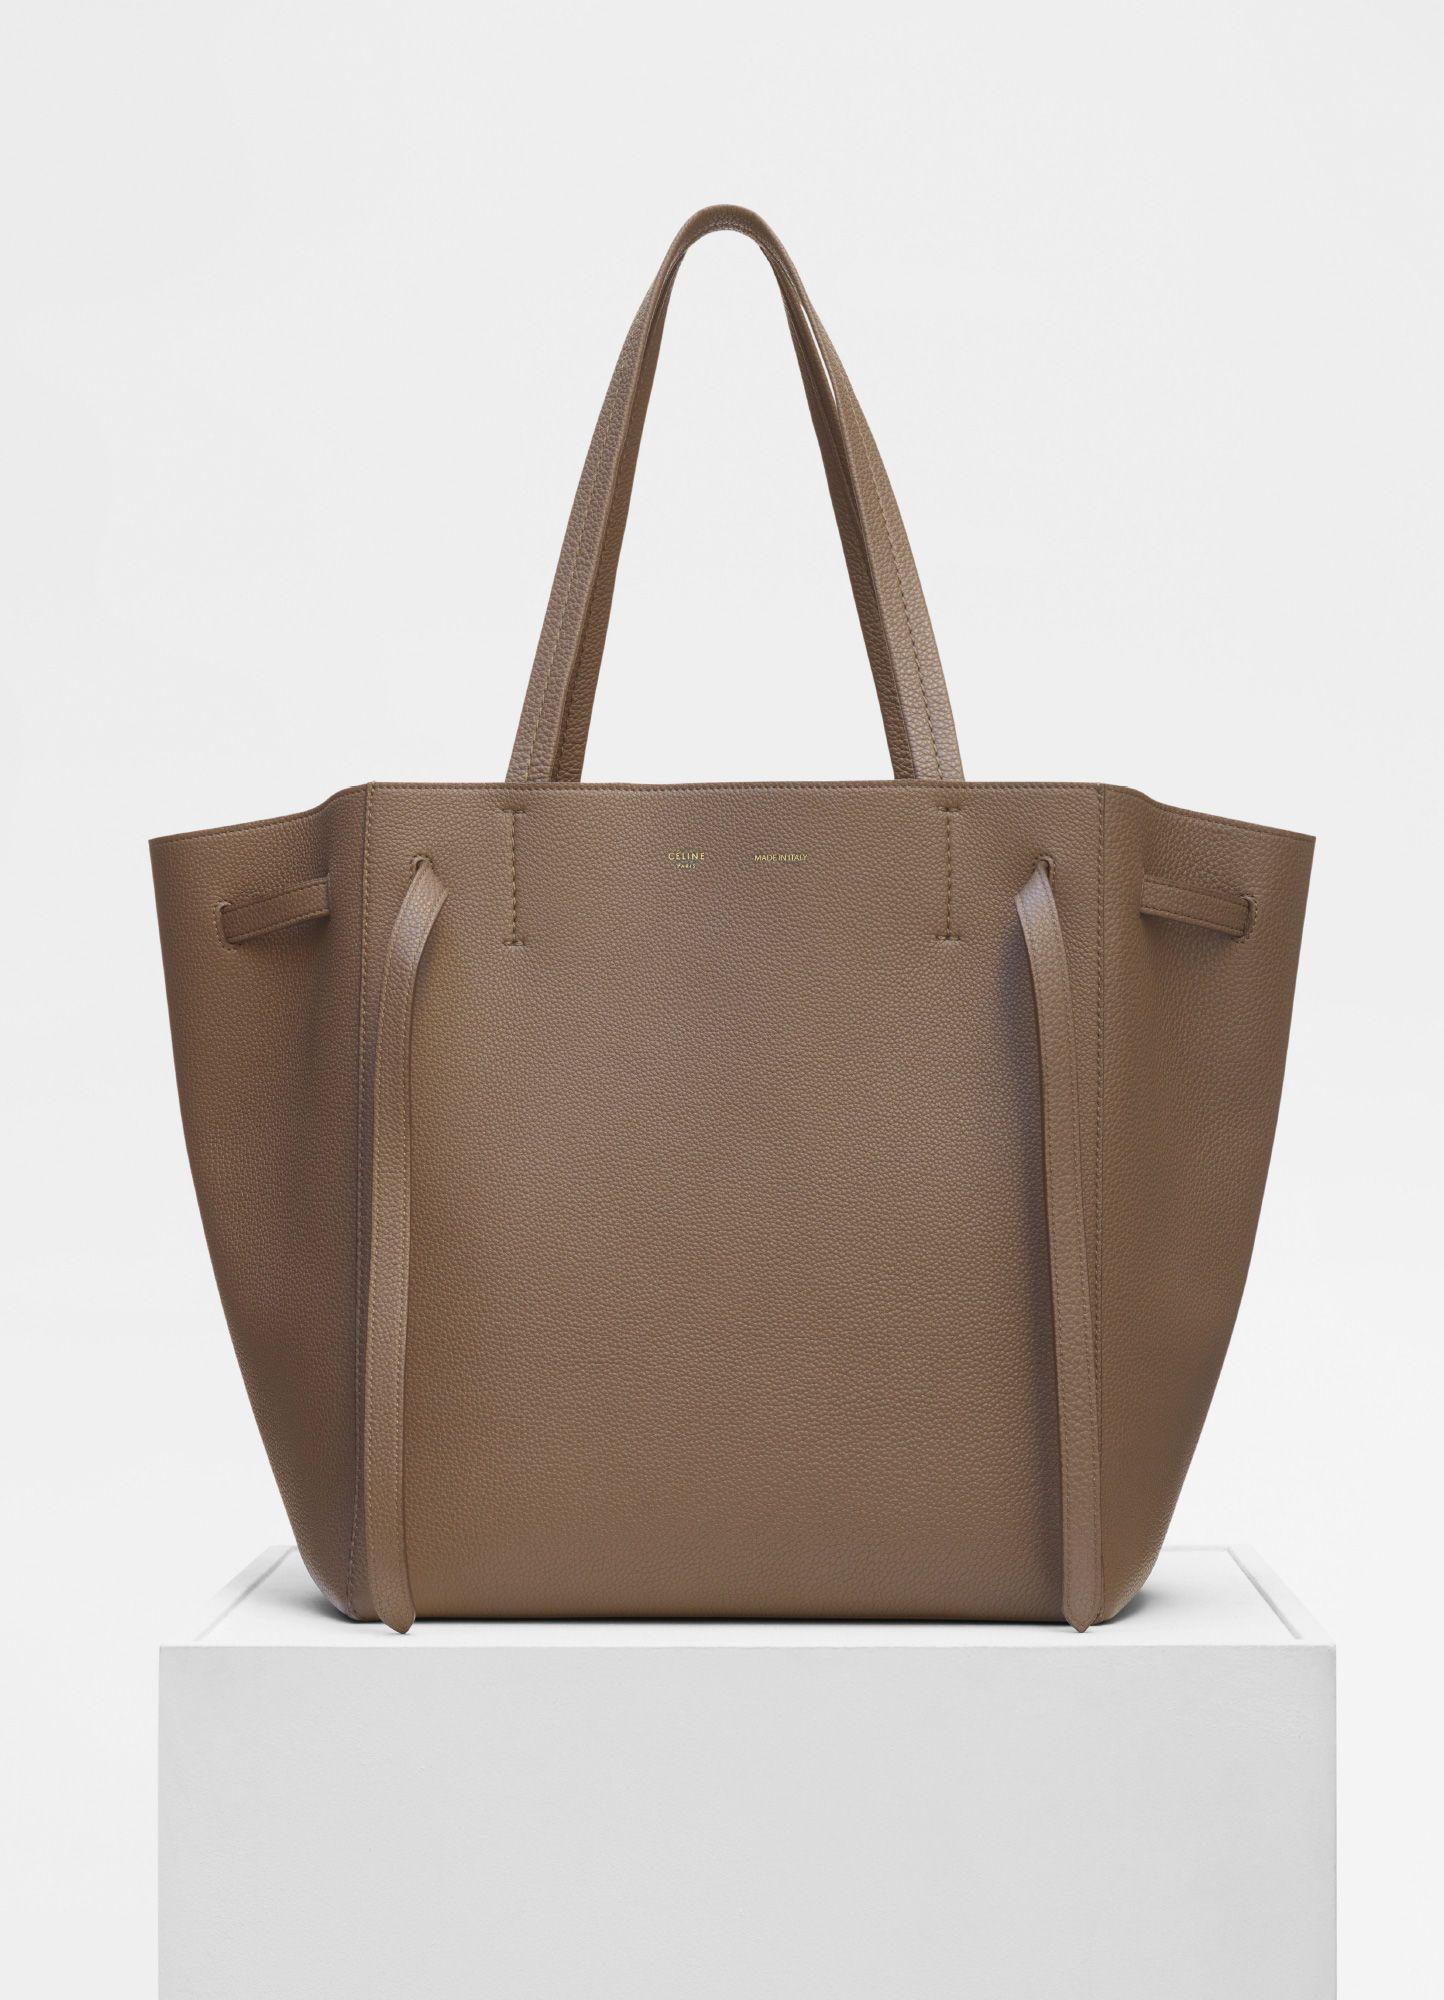 5c1904caa57 ... best cheap f6bb3 44831 Small Cabas Phantom in soft grained calfskin -  Handbags CÉLINE ...